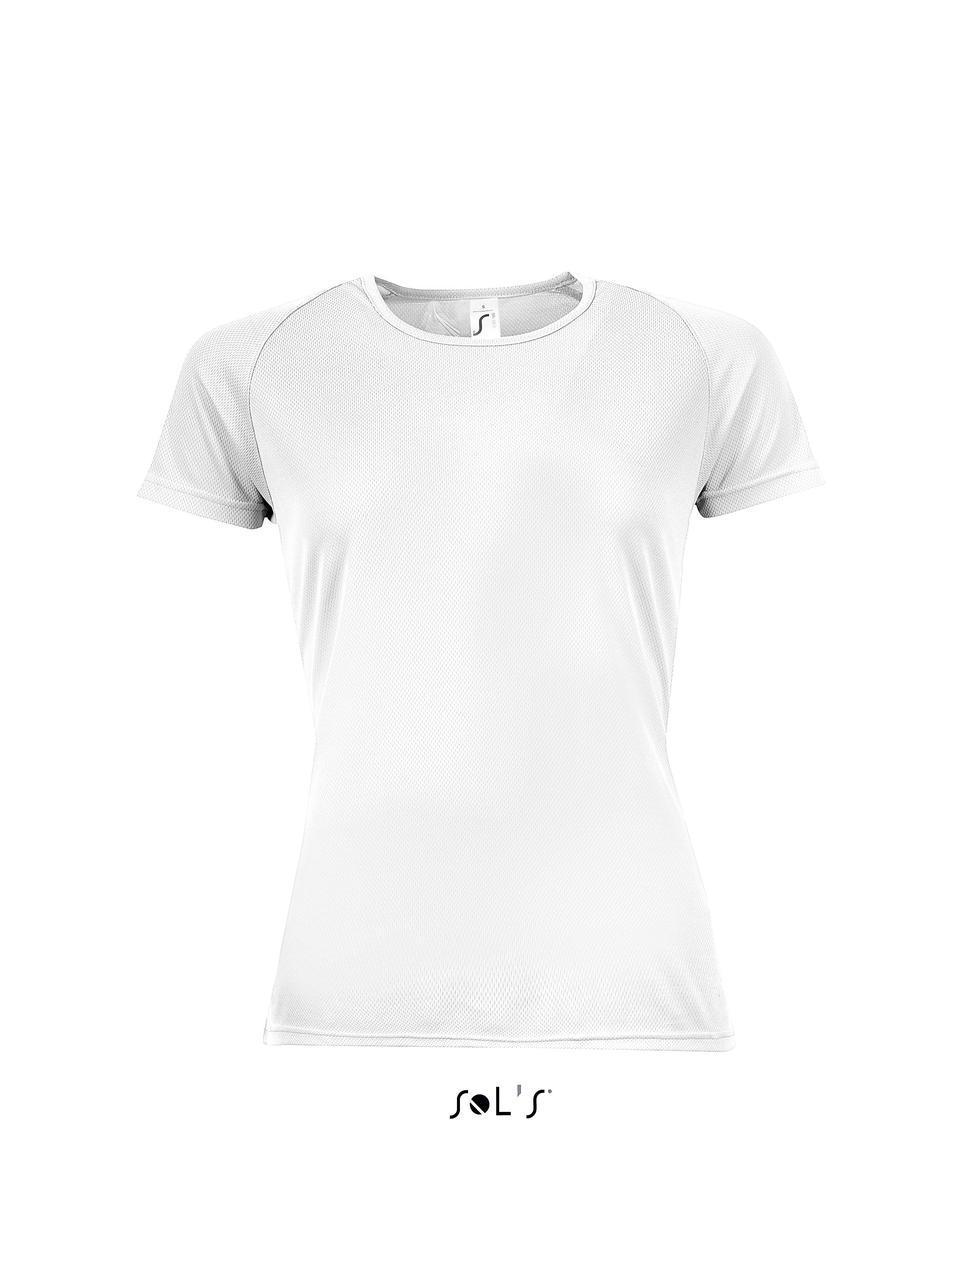 Футболка женская Sol's SPORTY. Цвет Белый. Размер L